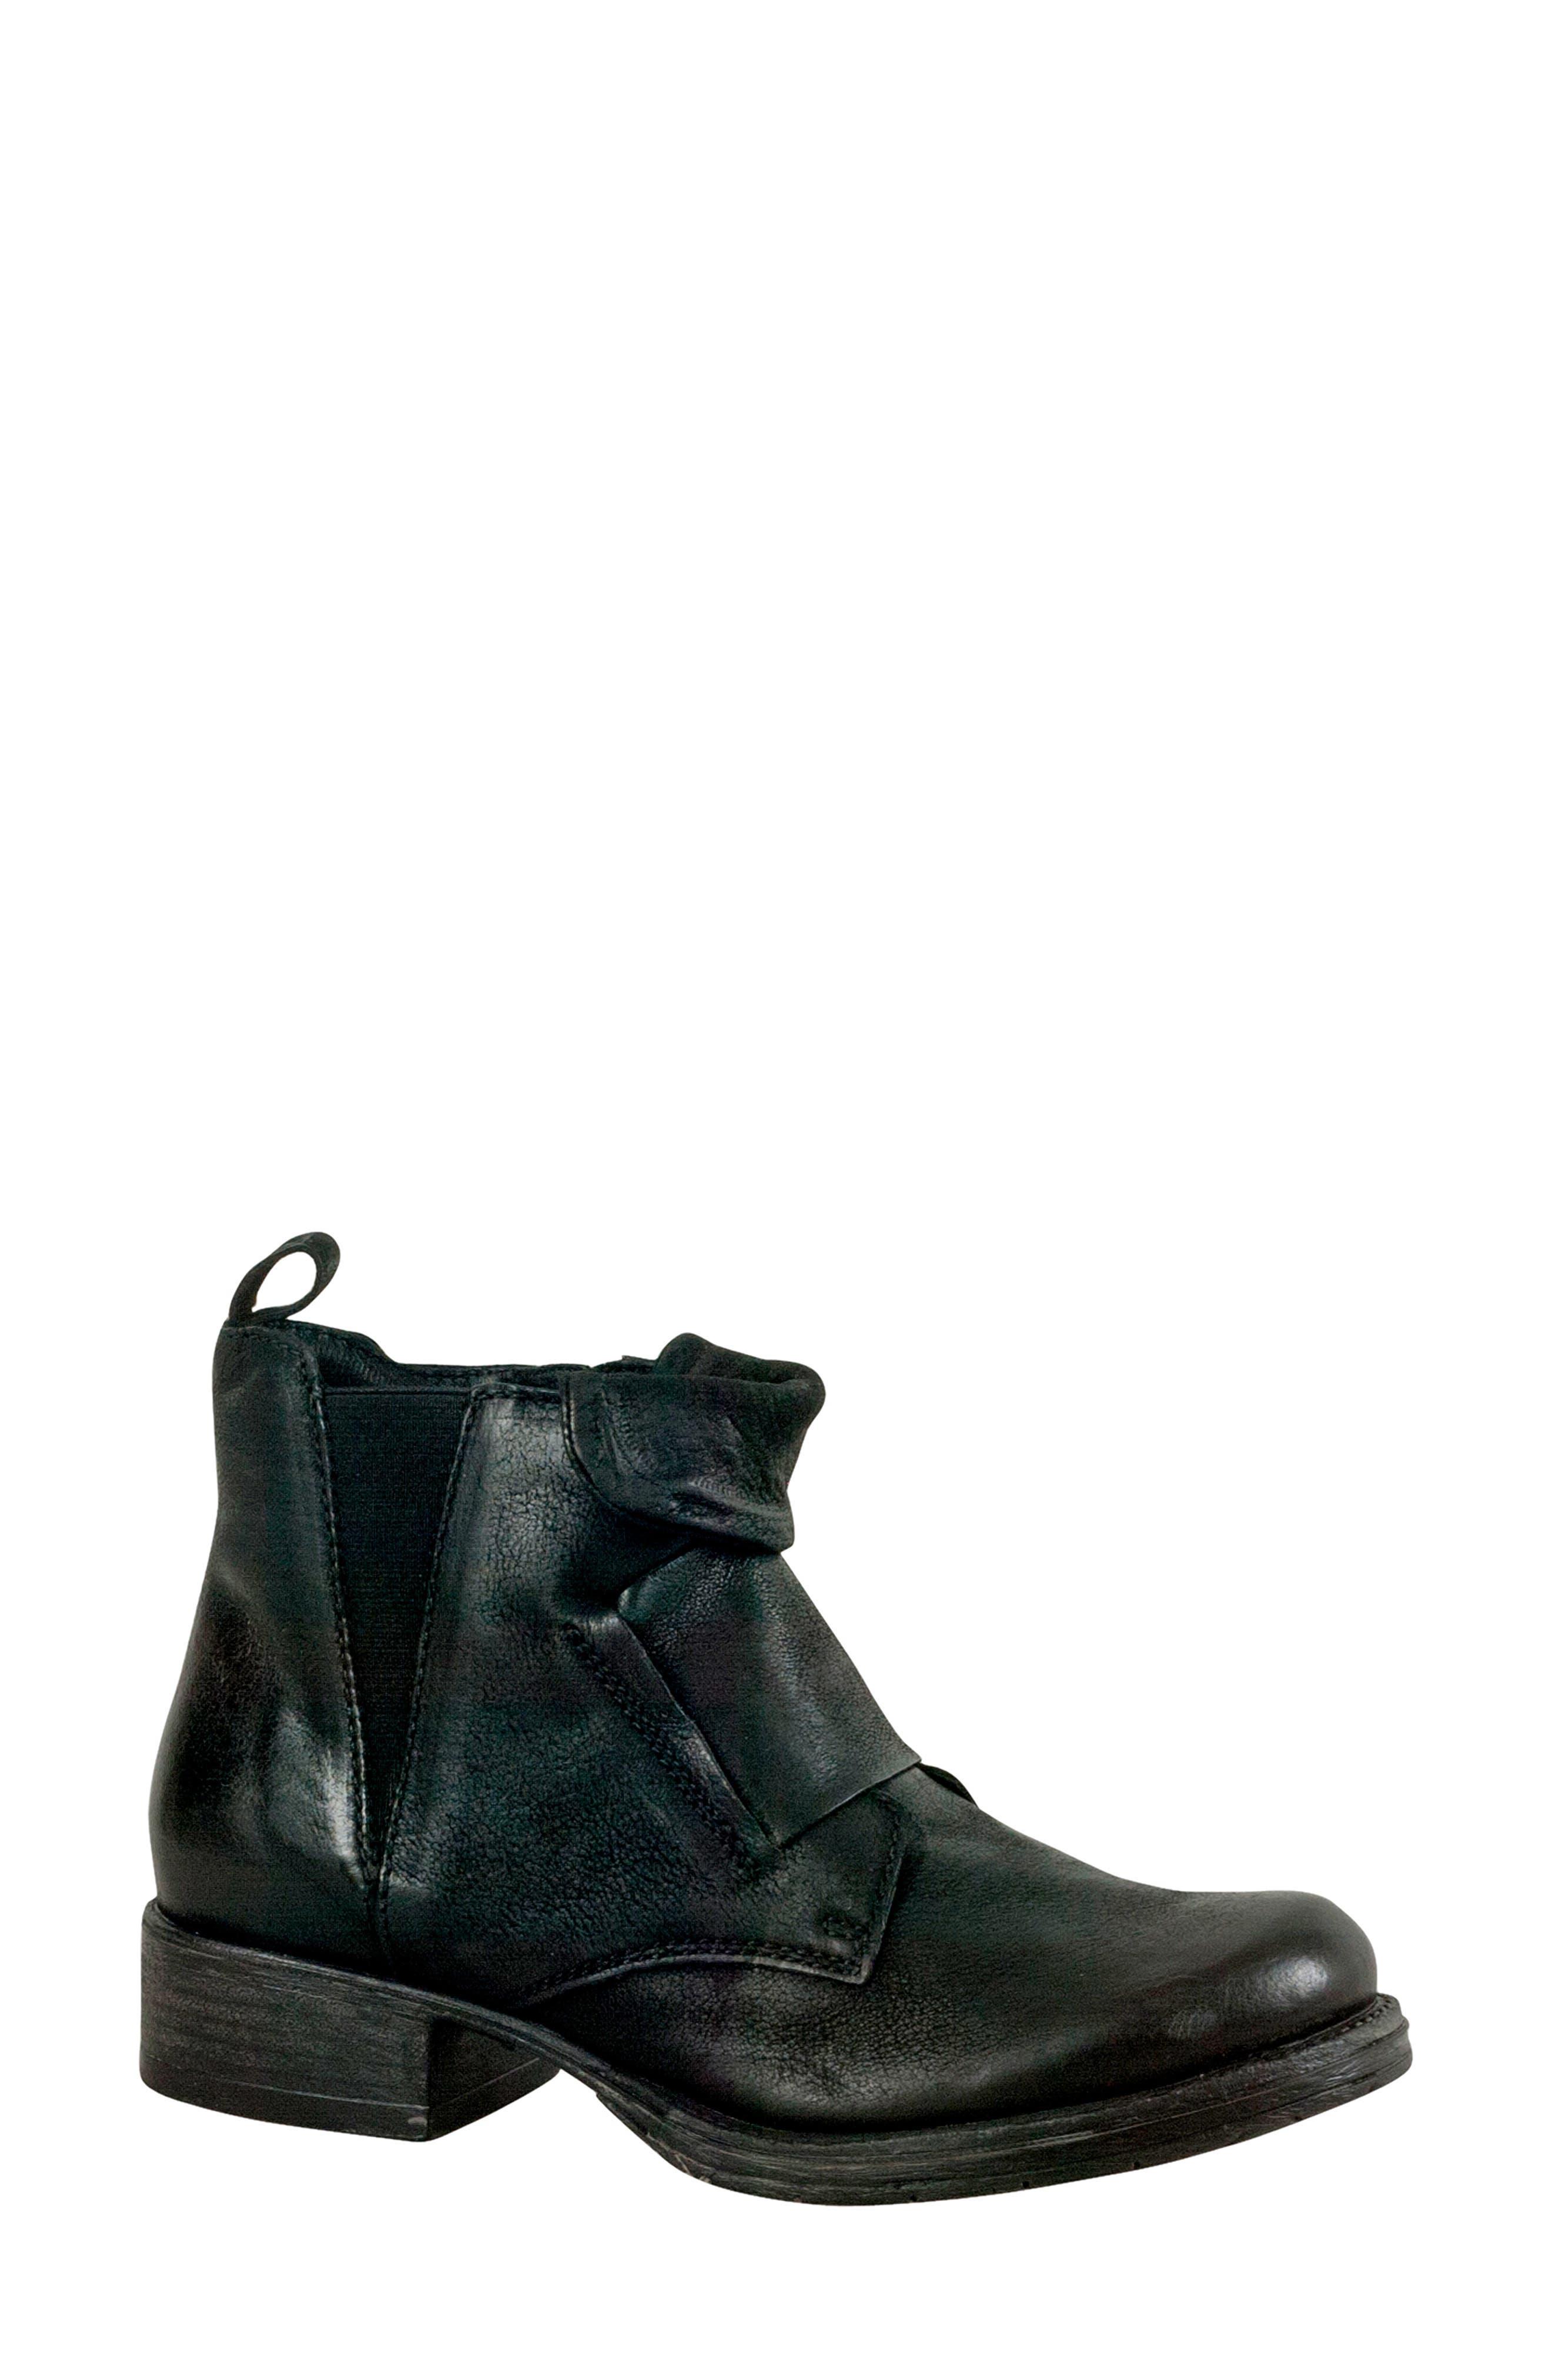 MIZ MOOZ Nicholas Boot, Main, color, BLACK LEATHER